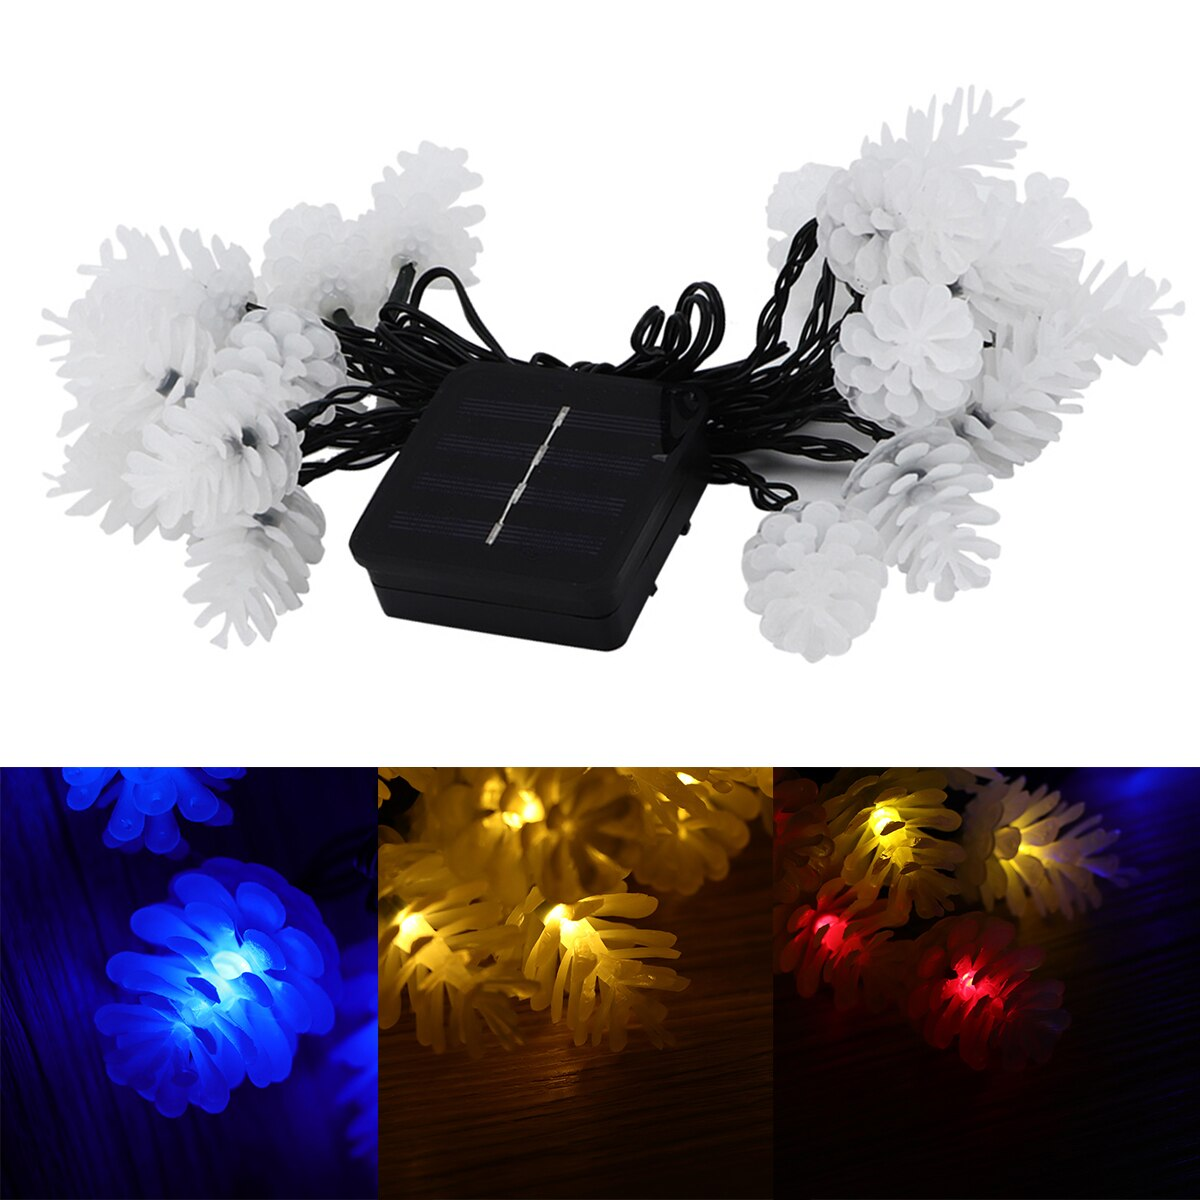 4.8M 20 LED Solar Powered String Light Outdoor Crystal Ball Fairy Lights For Garden Fence Landscape Christmas Decoration